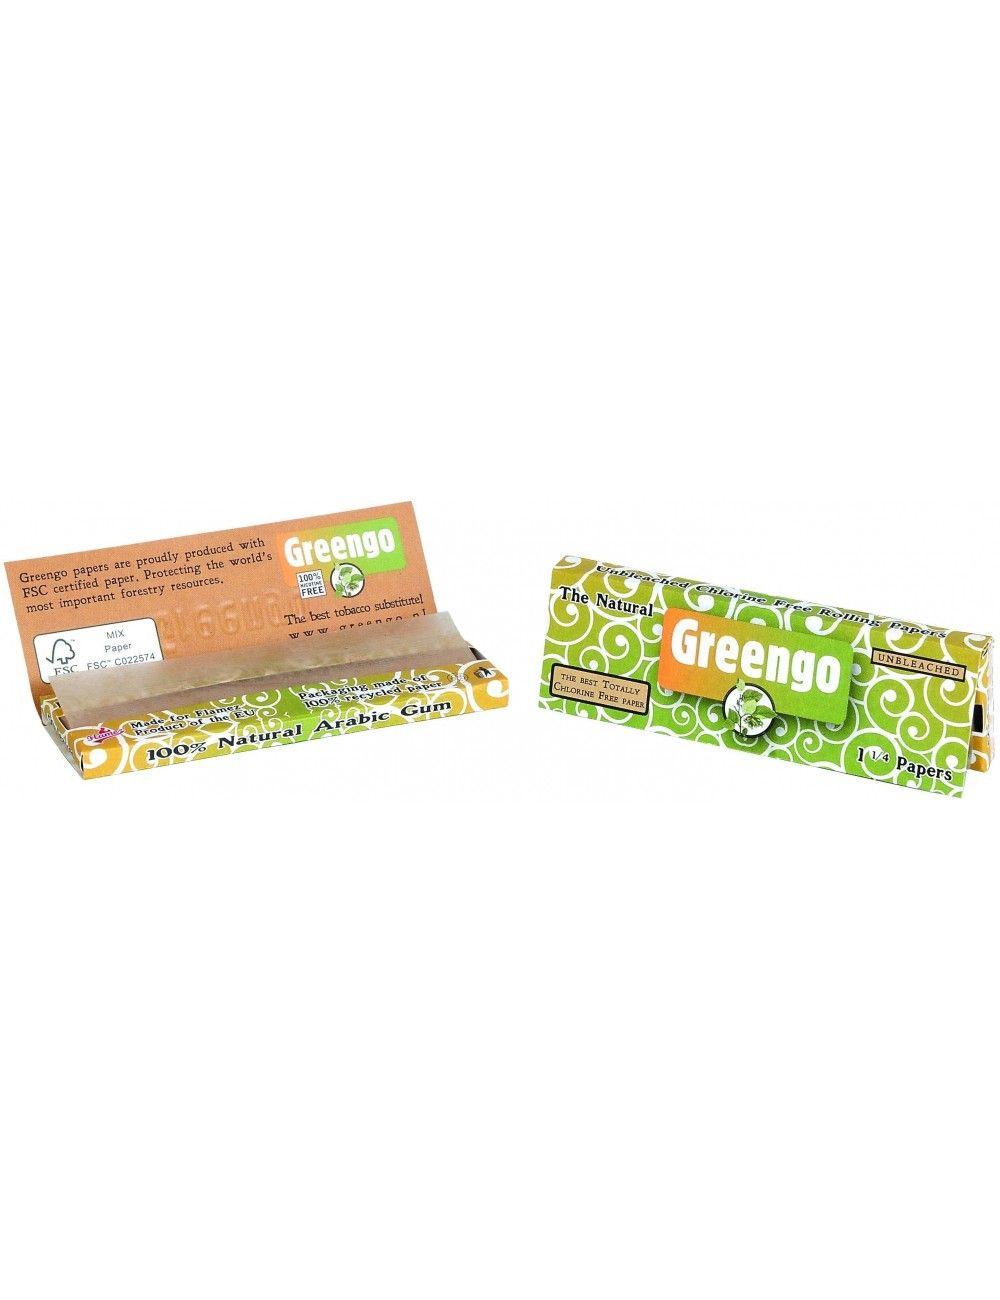 GreenGo 1 1/4 Size